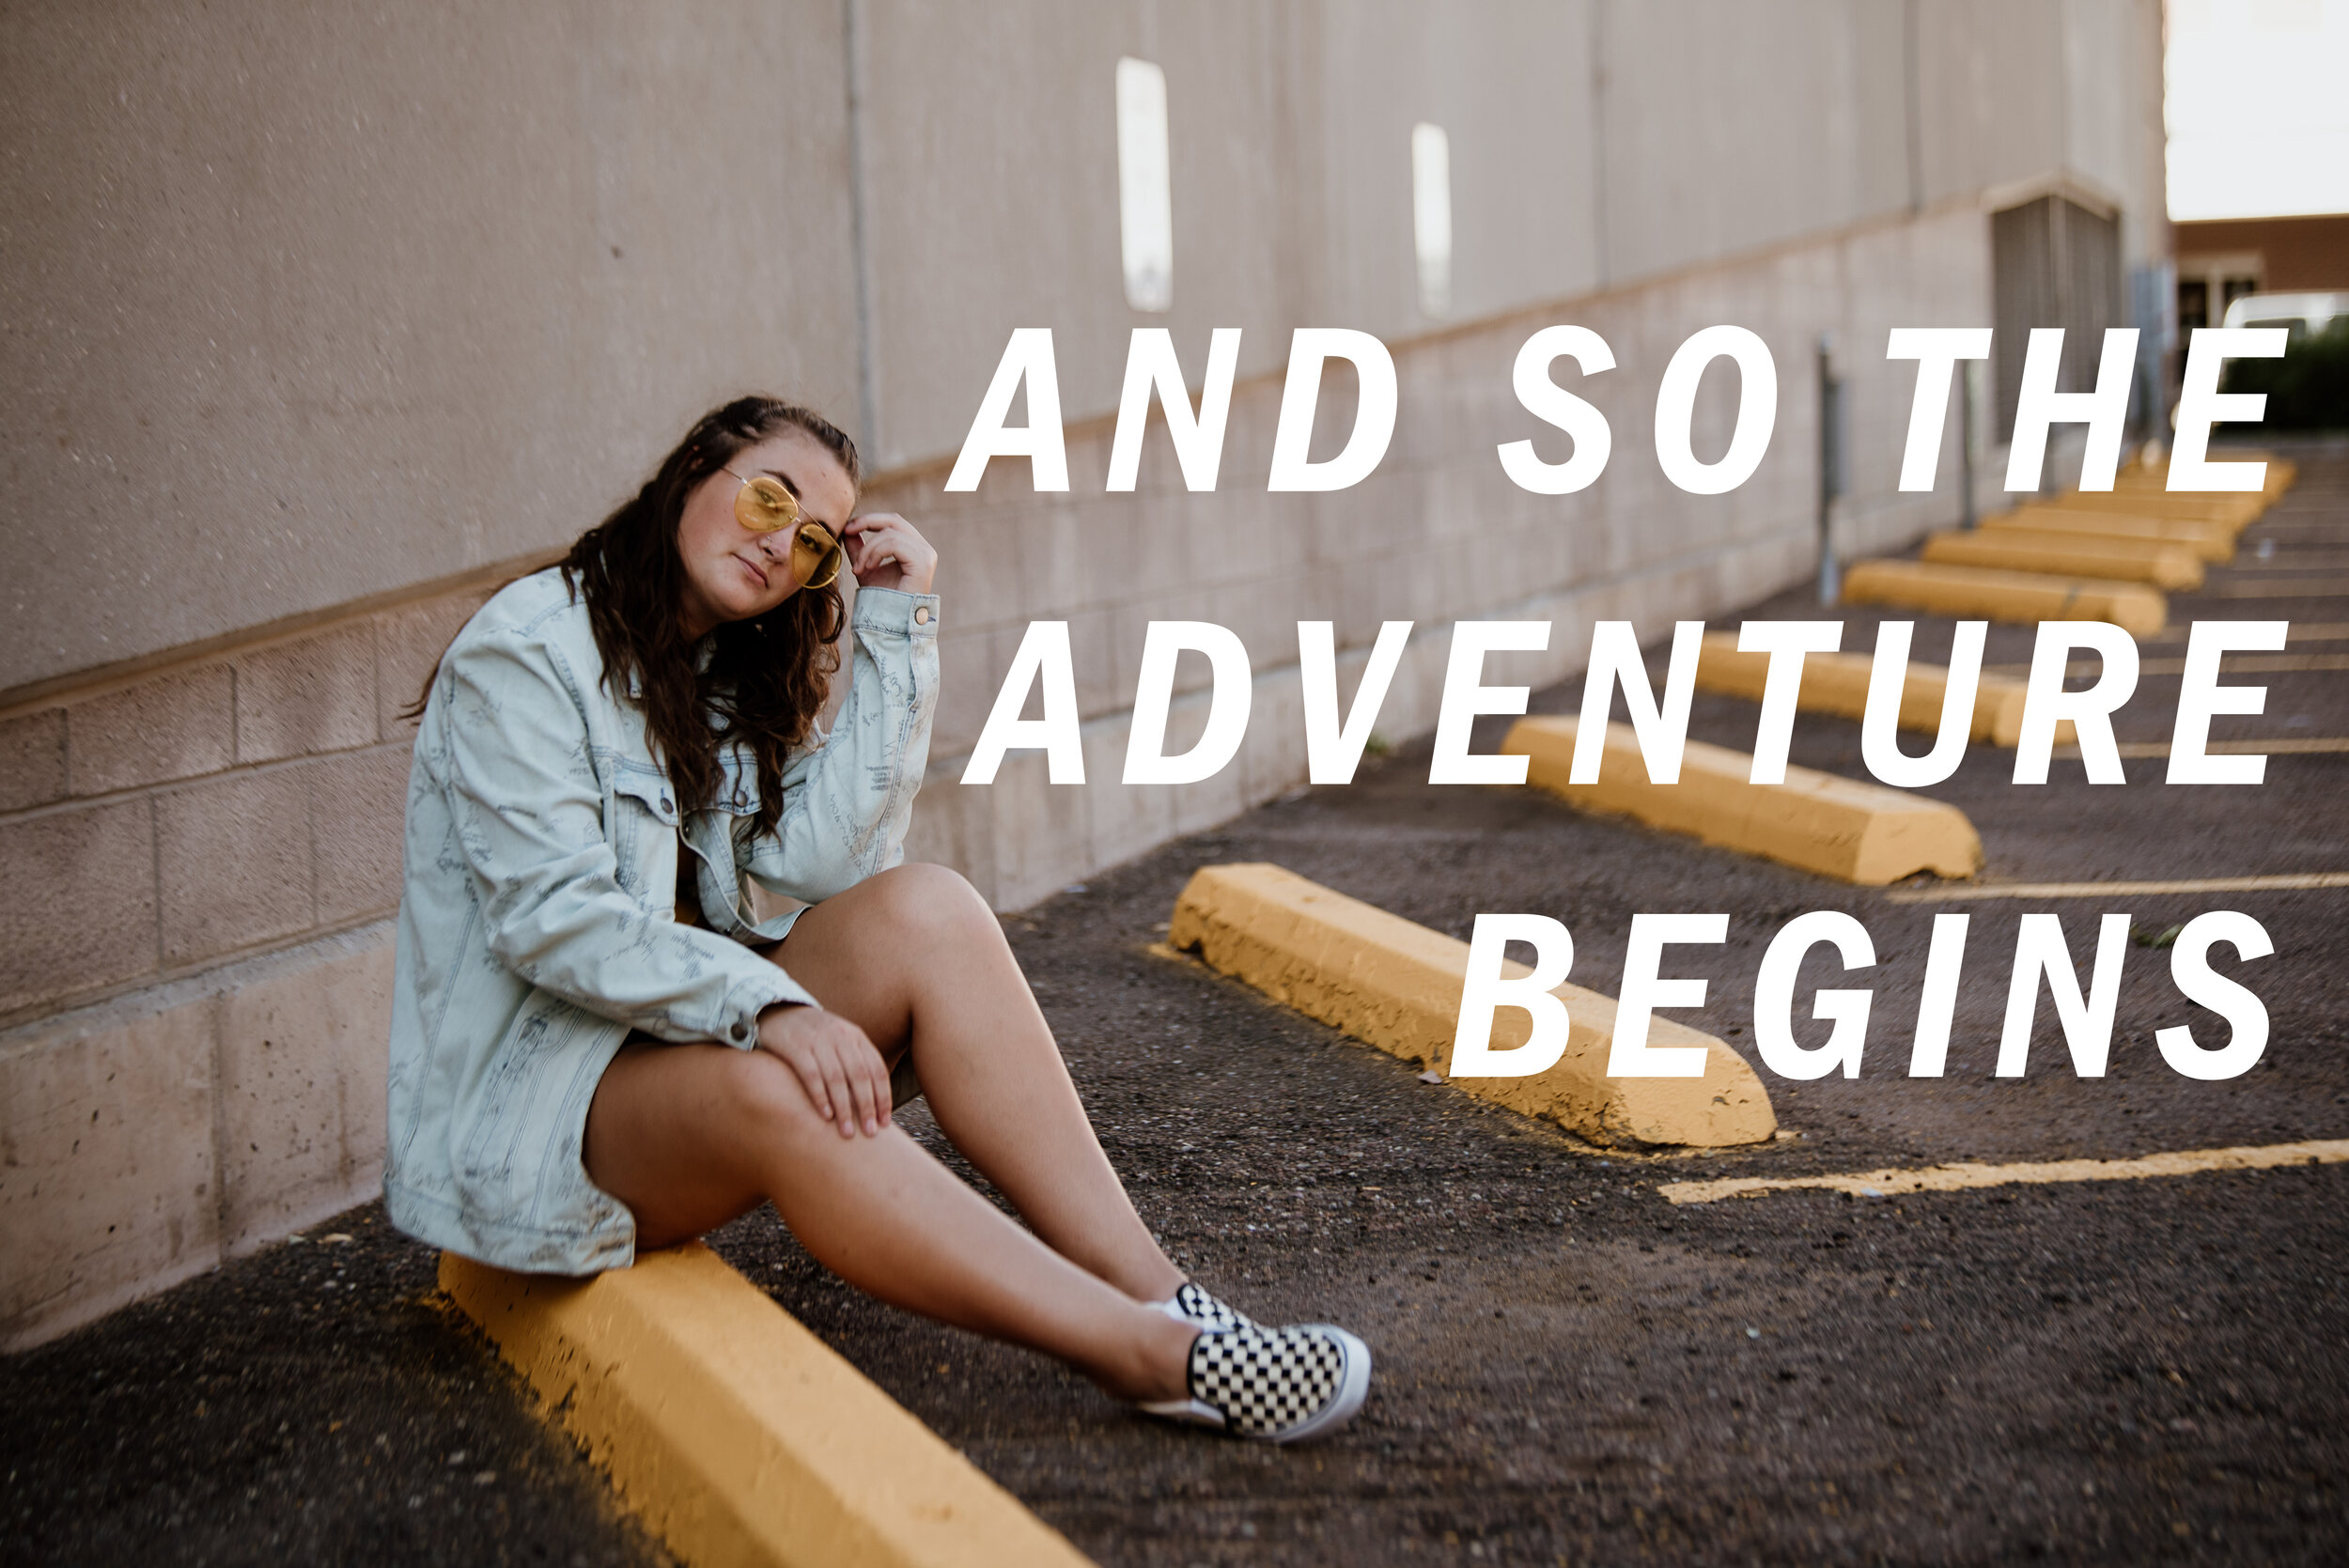 Shivell_senior_2019_adventure.jpg